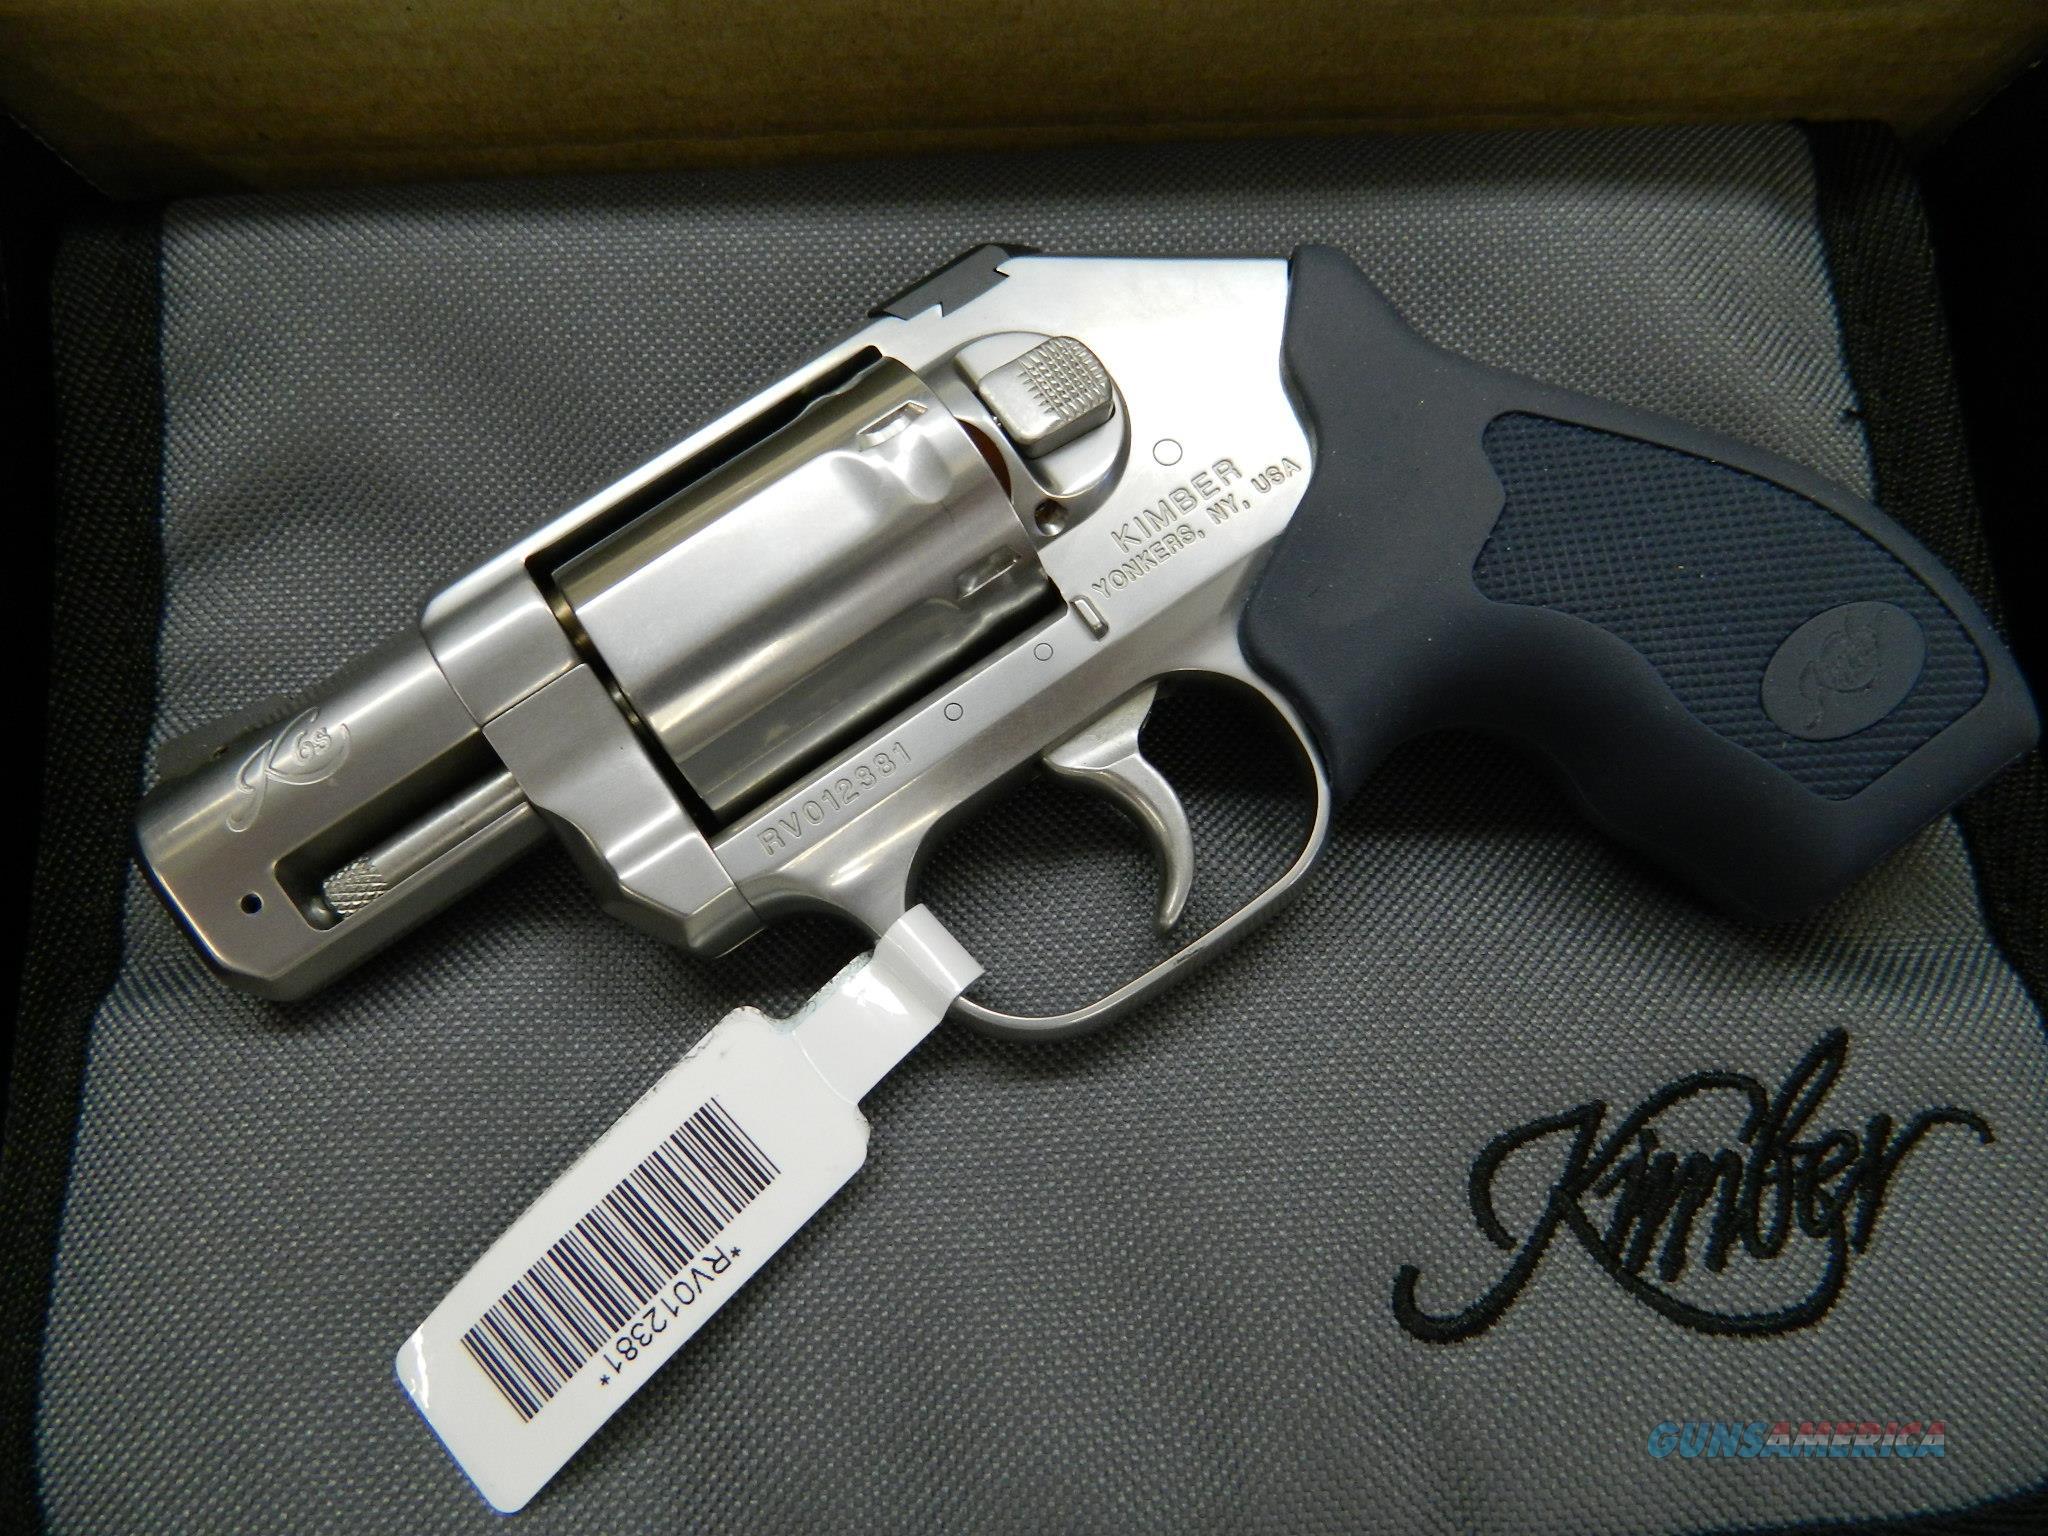 Kimber K6s Stainless  revolver .357 MAG  NIB 357  Guns > Pistols > Kimber of America Pistols > Revolvers